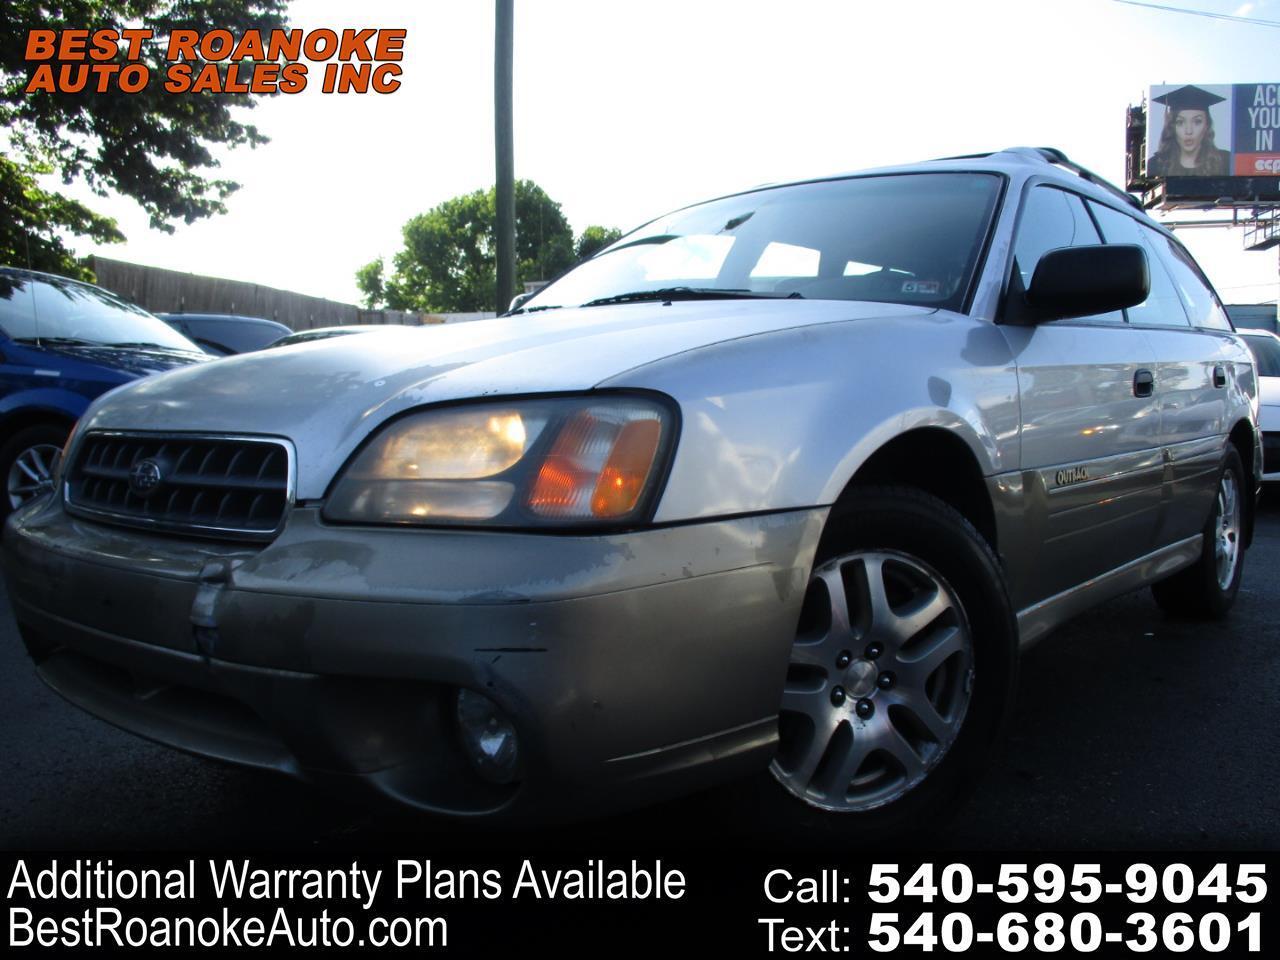 2003 Subaru Legacy Wagon 5dr Outback Auto